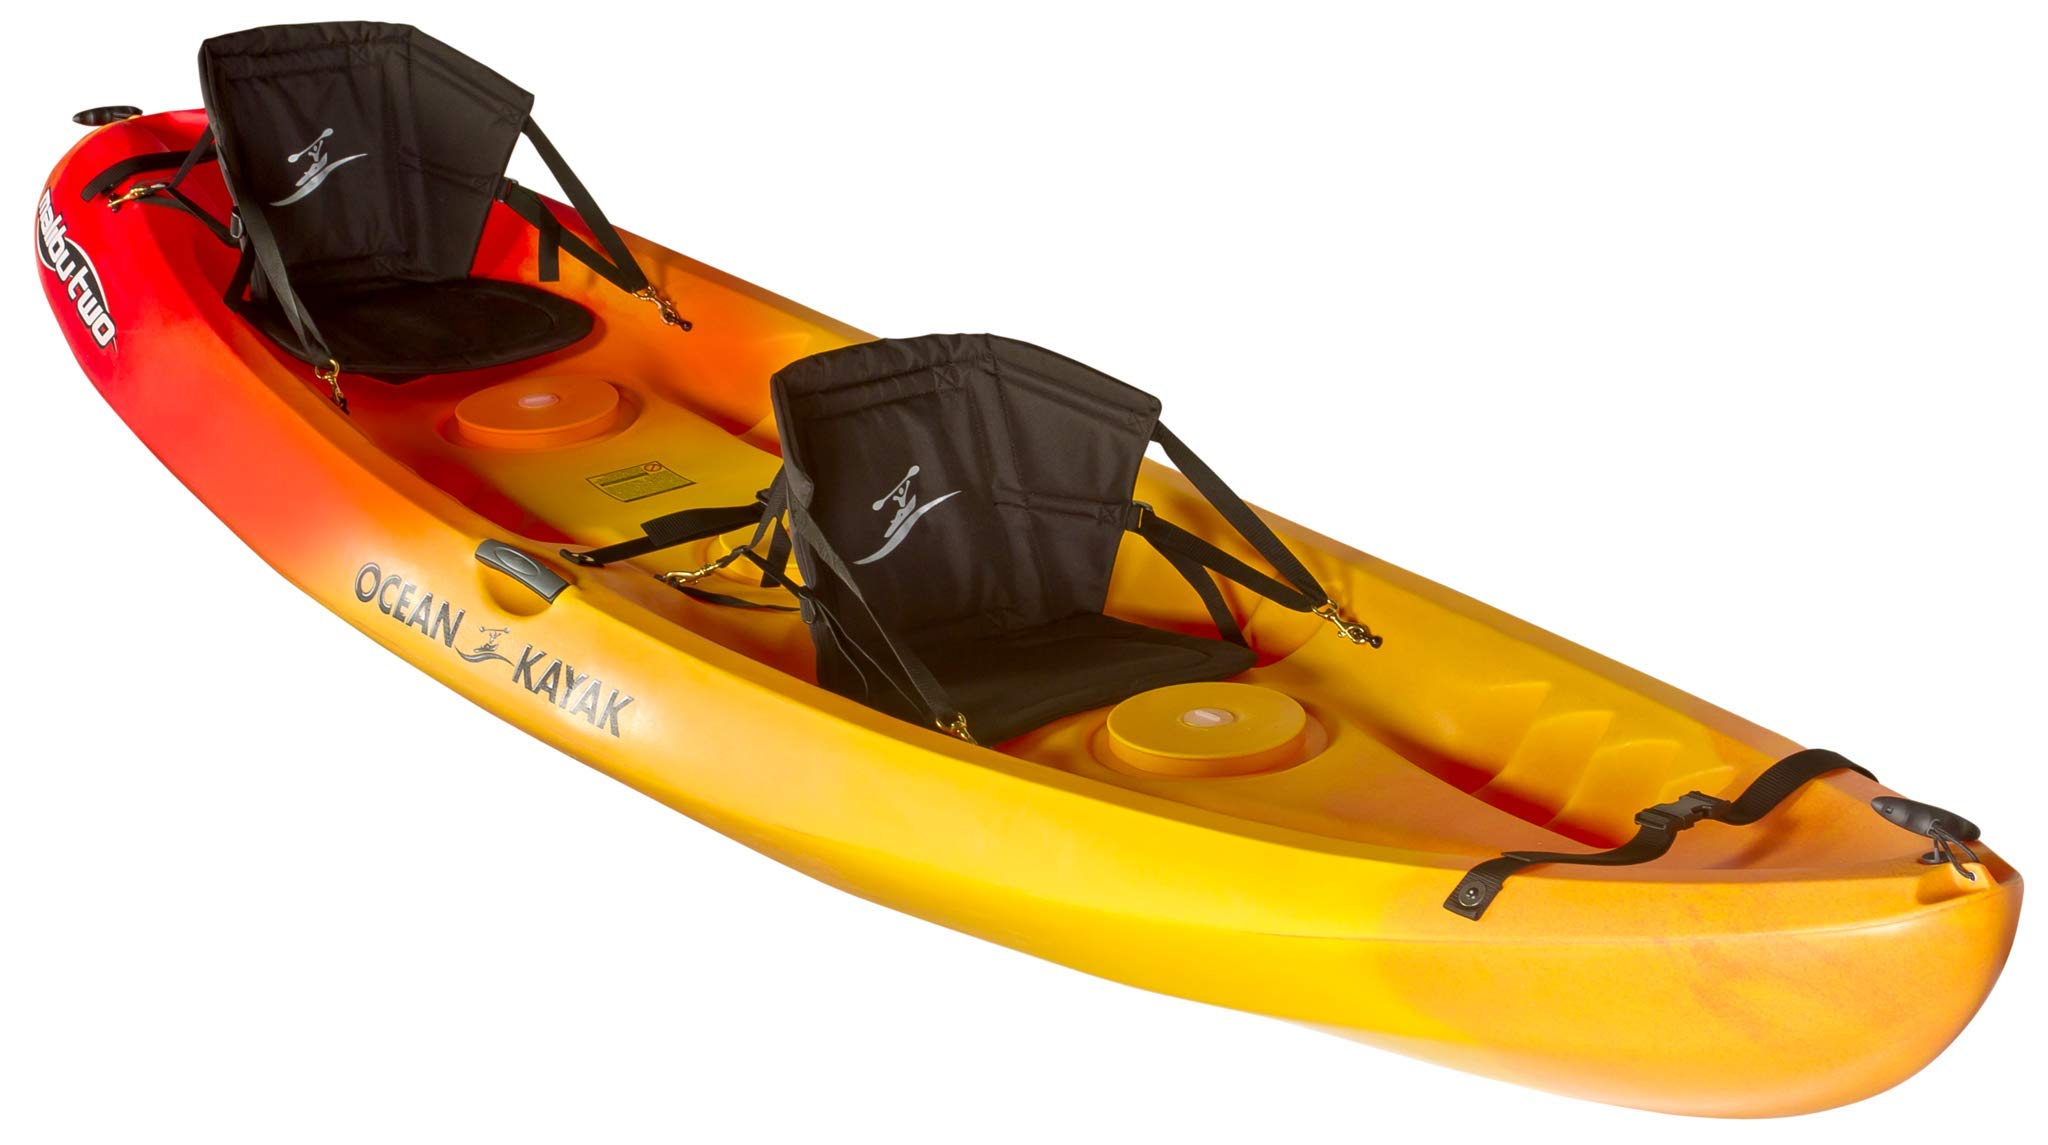 Ocean Kayak Malibu Two Tandem Sit-On-Top Recreational Kayak (Sunrise, 12-Feet) by Ocean Kayak